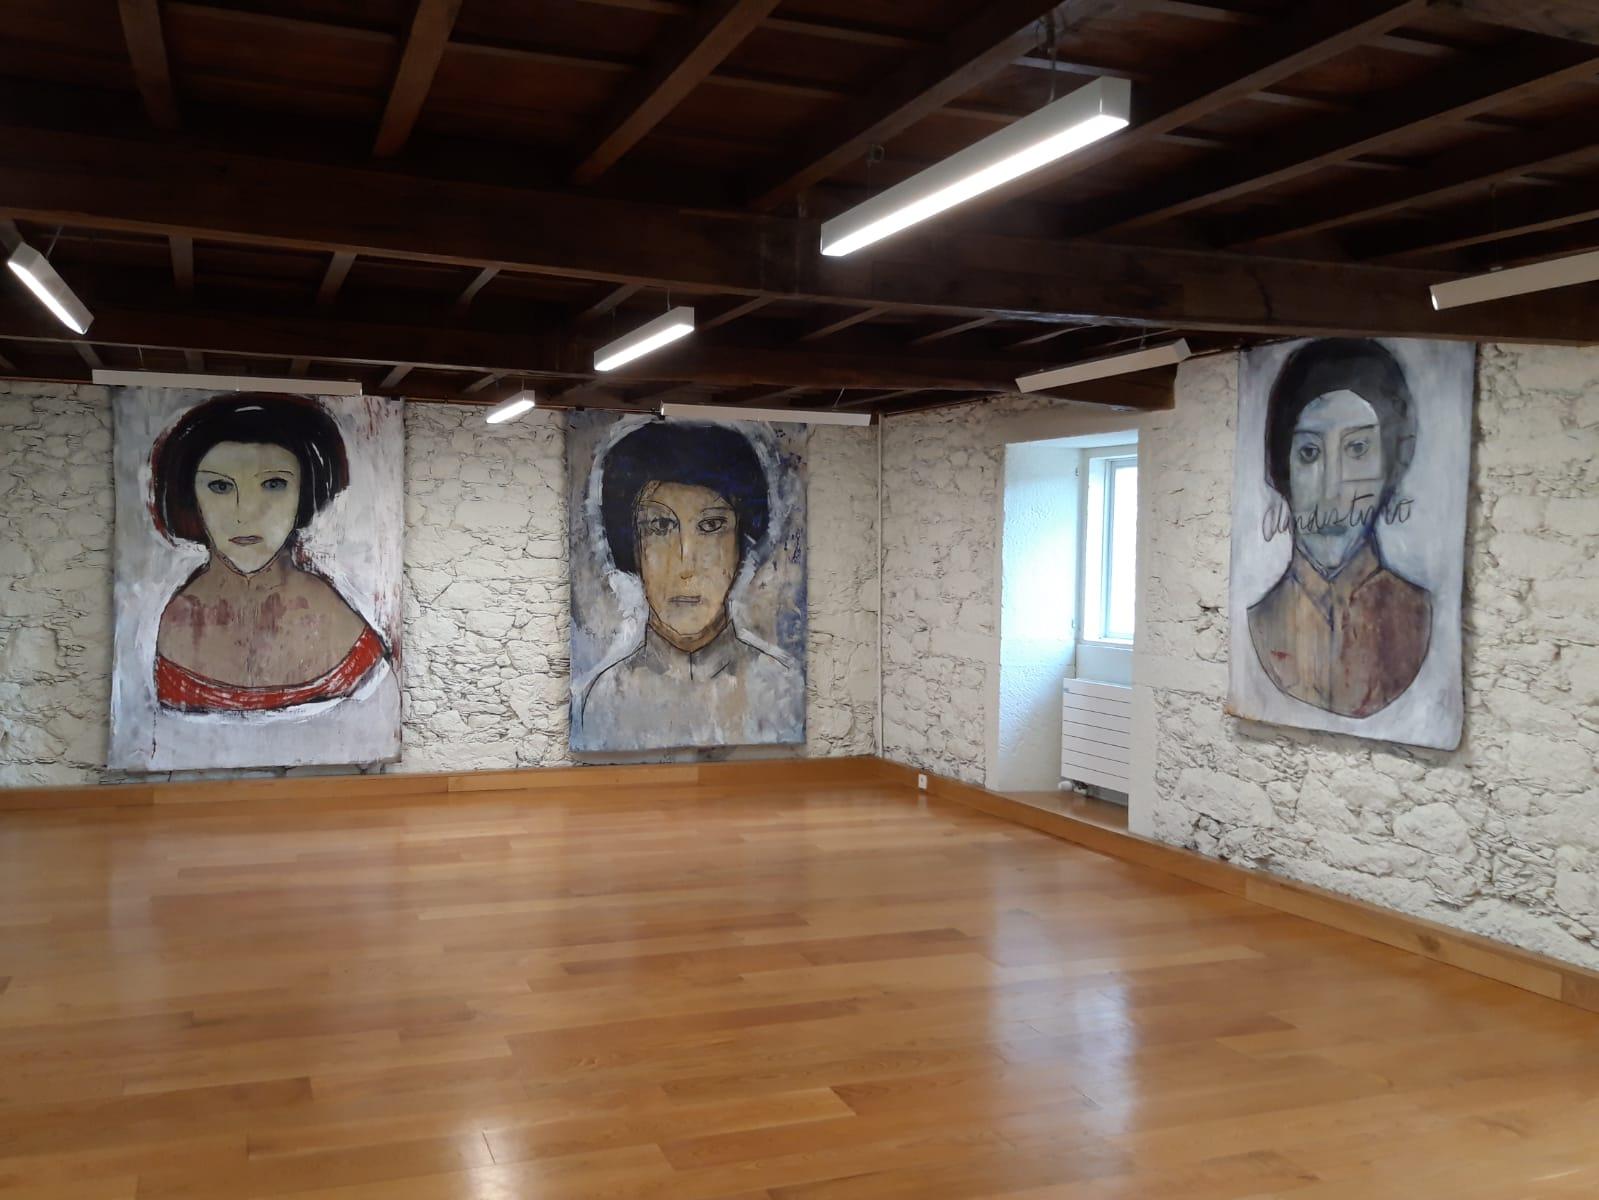 Exposicion Belkiss Oliveira, Instituto de Estudos Ulloáns, IEU